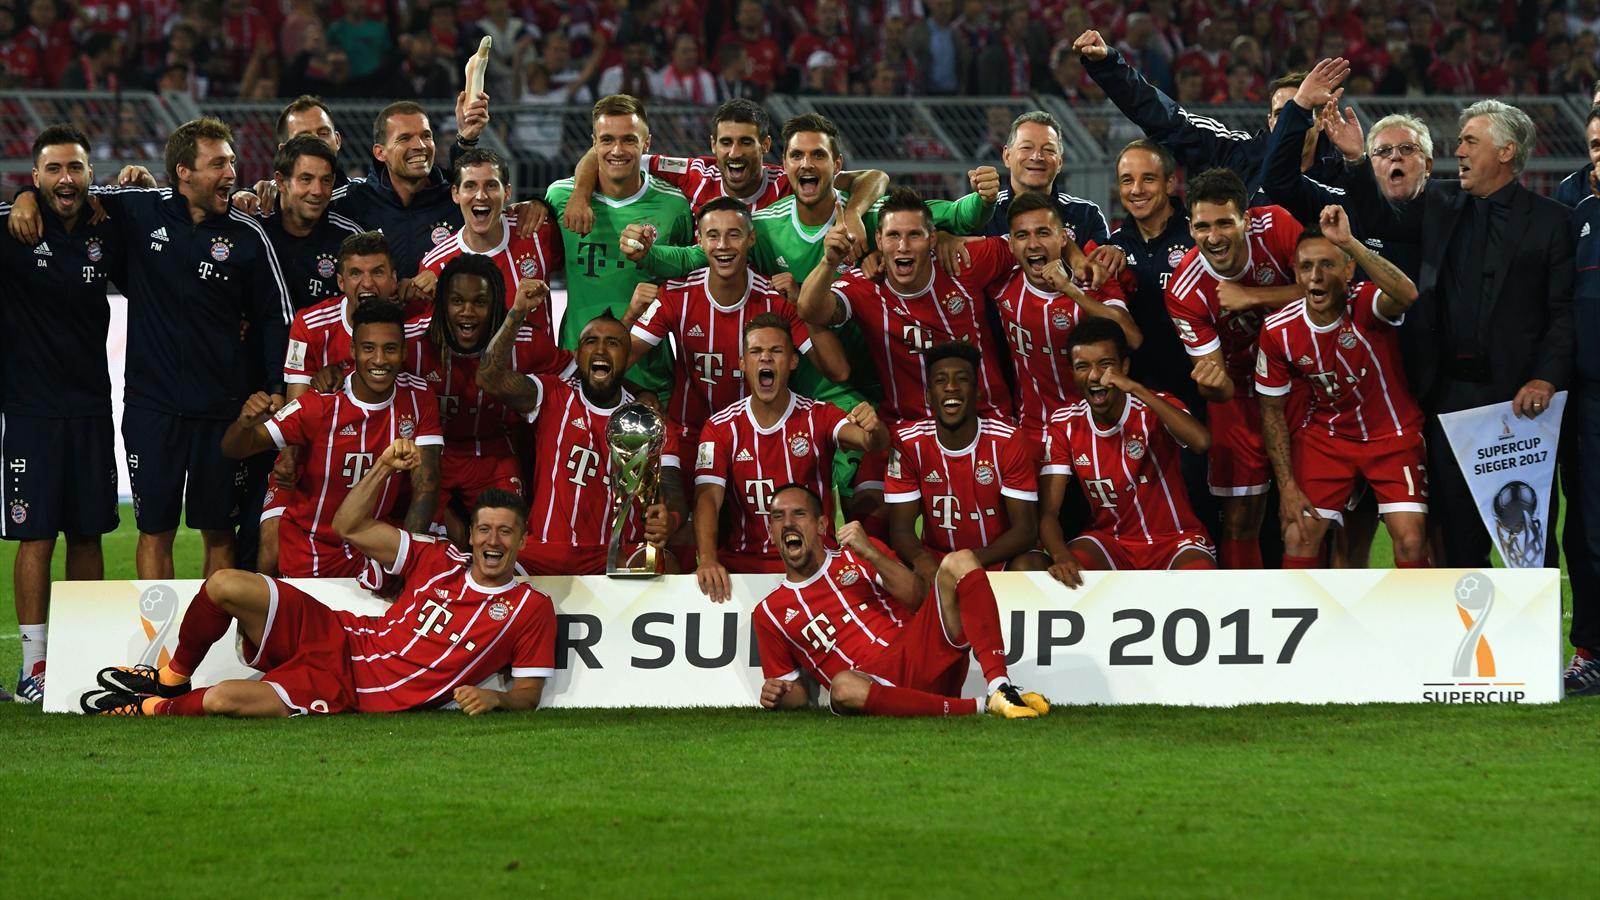 Bundesliga Supercup 2020